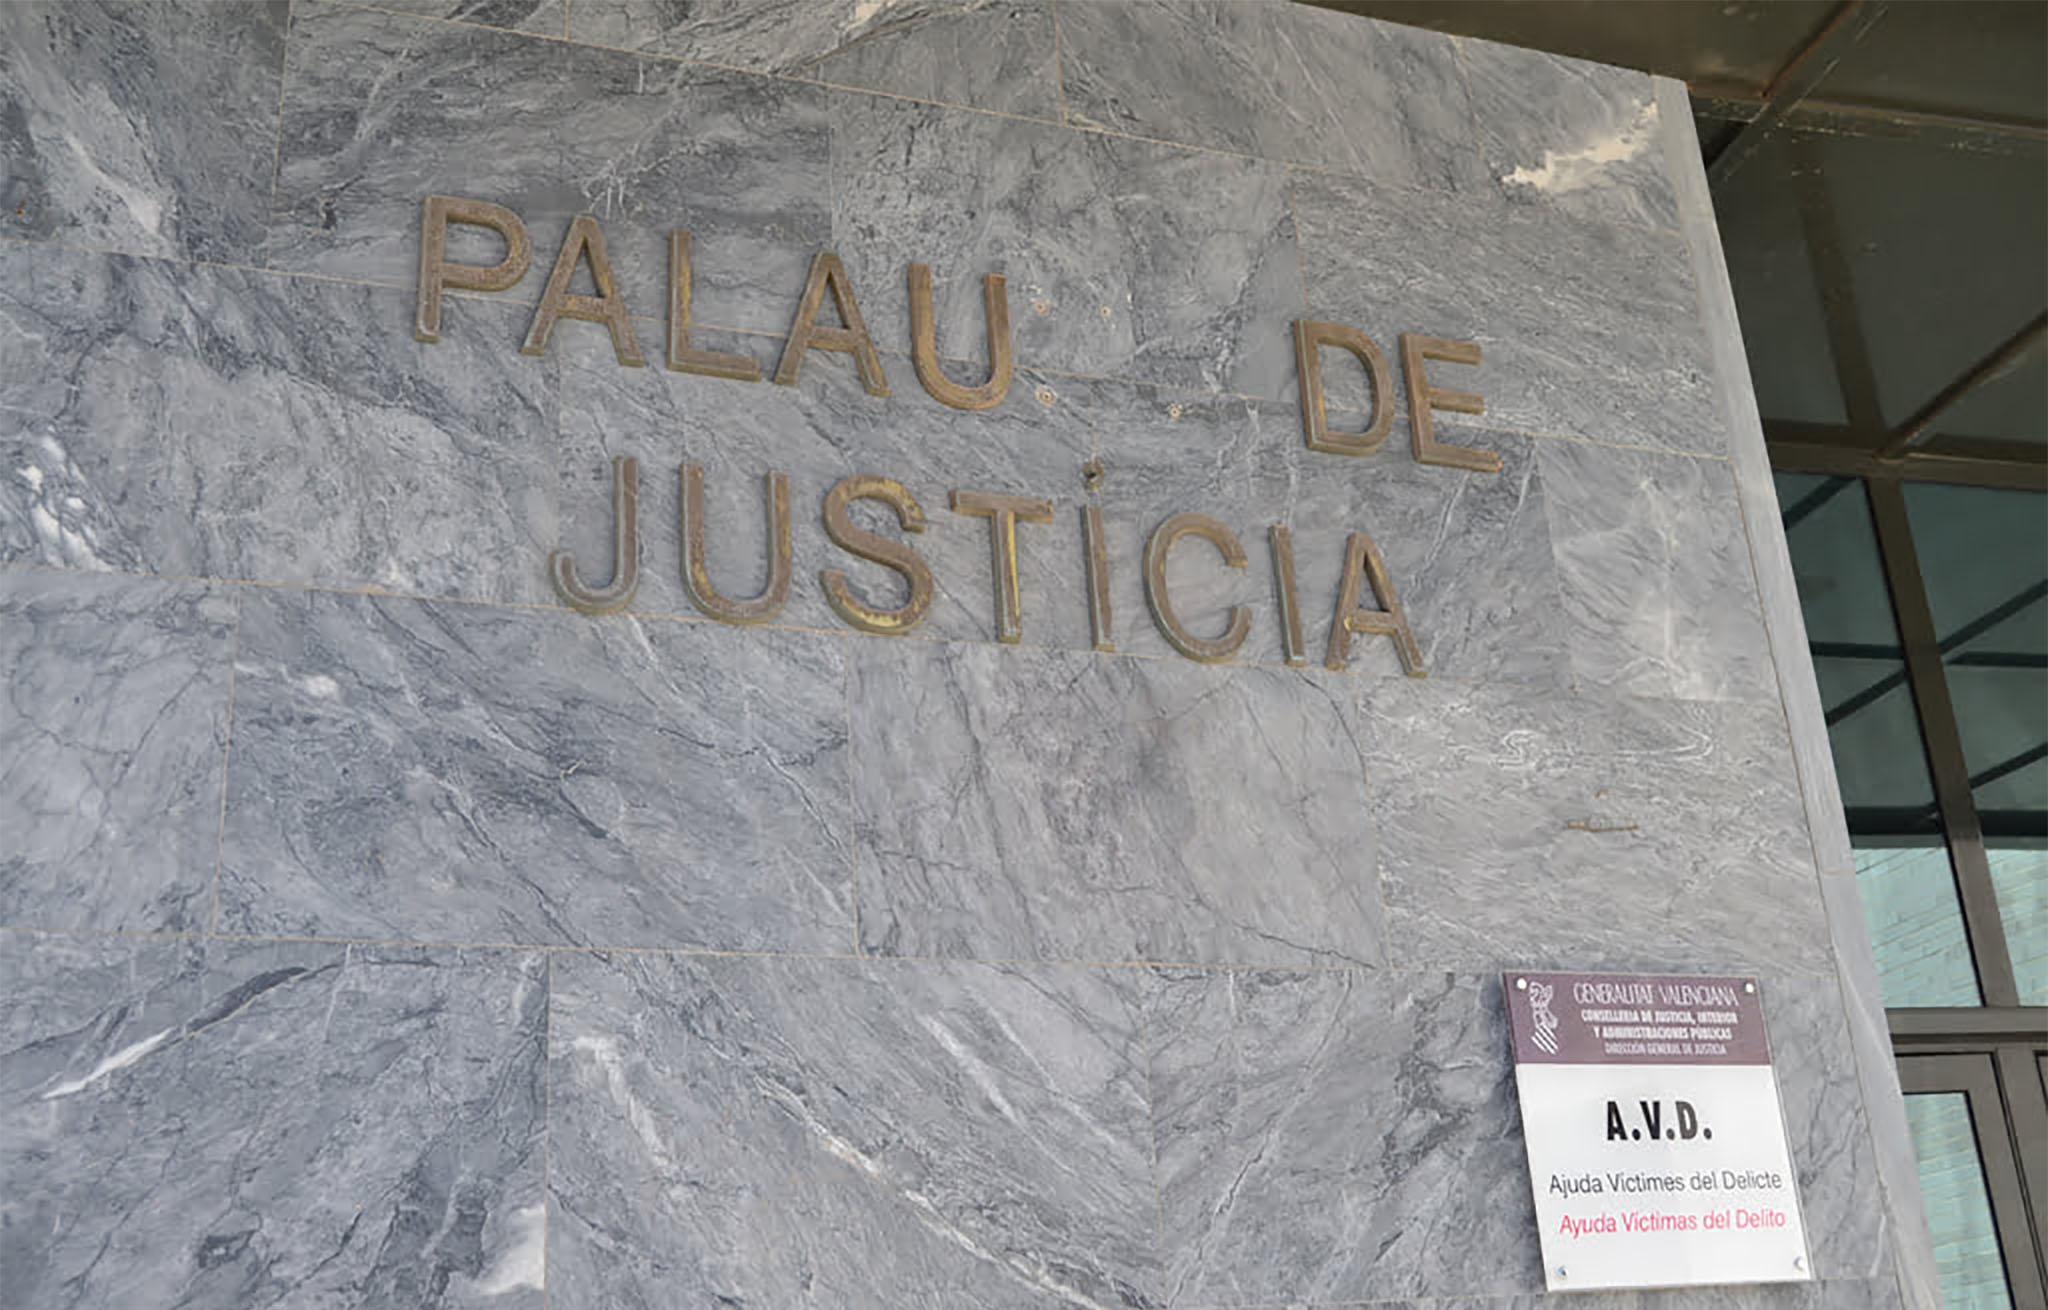 Palau de la Justice Dénia